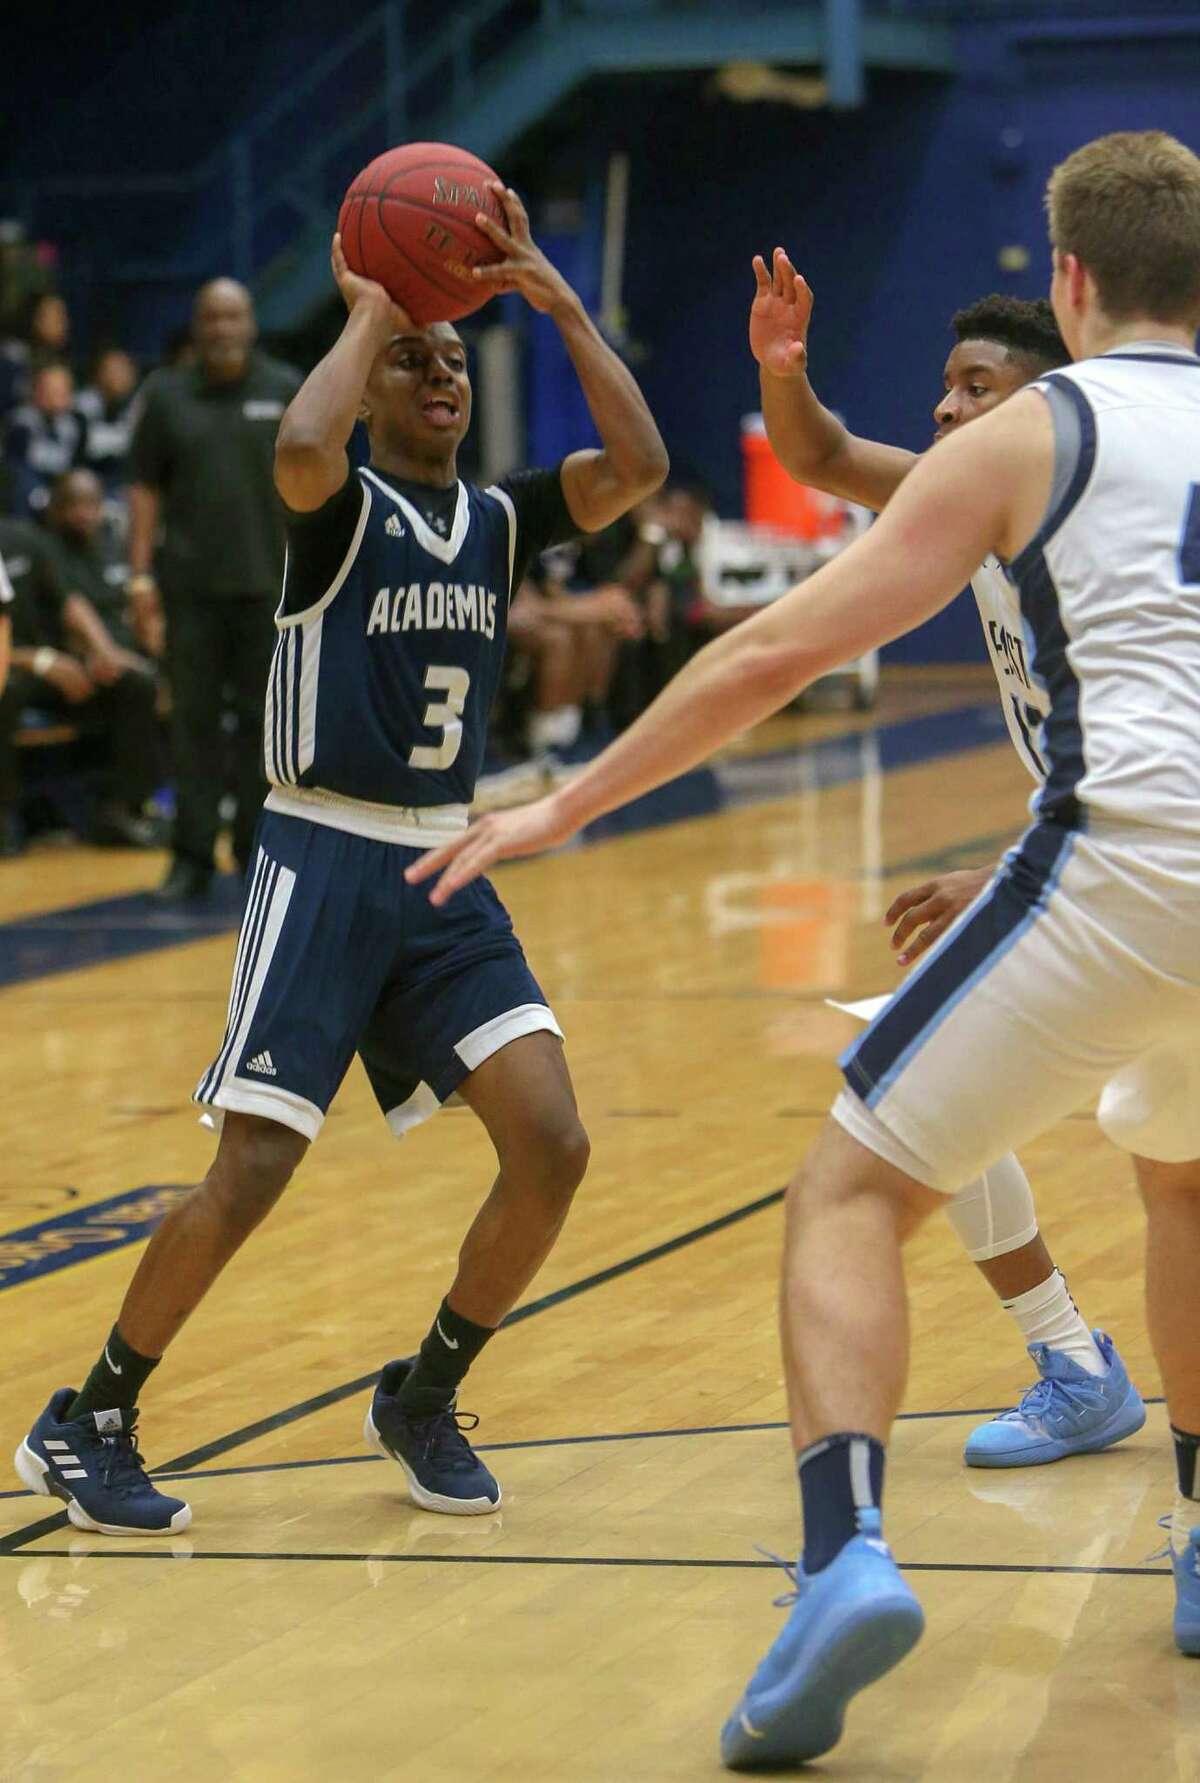 Hillhouse High School?'s Ta?'zhon Daniels takes a shot during the GHPA High School Basketball Classic against East Catholic High School at Trinity College in Hartford on Saturday, Dec. 15, 2018.